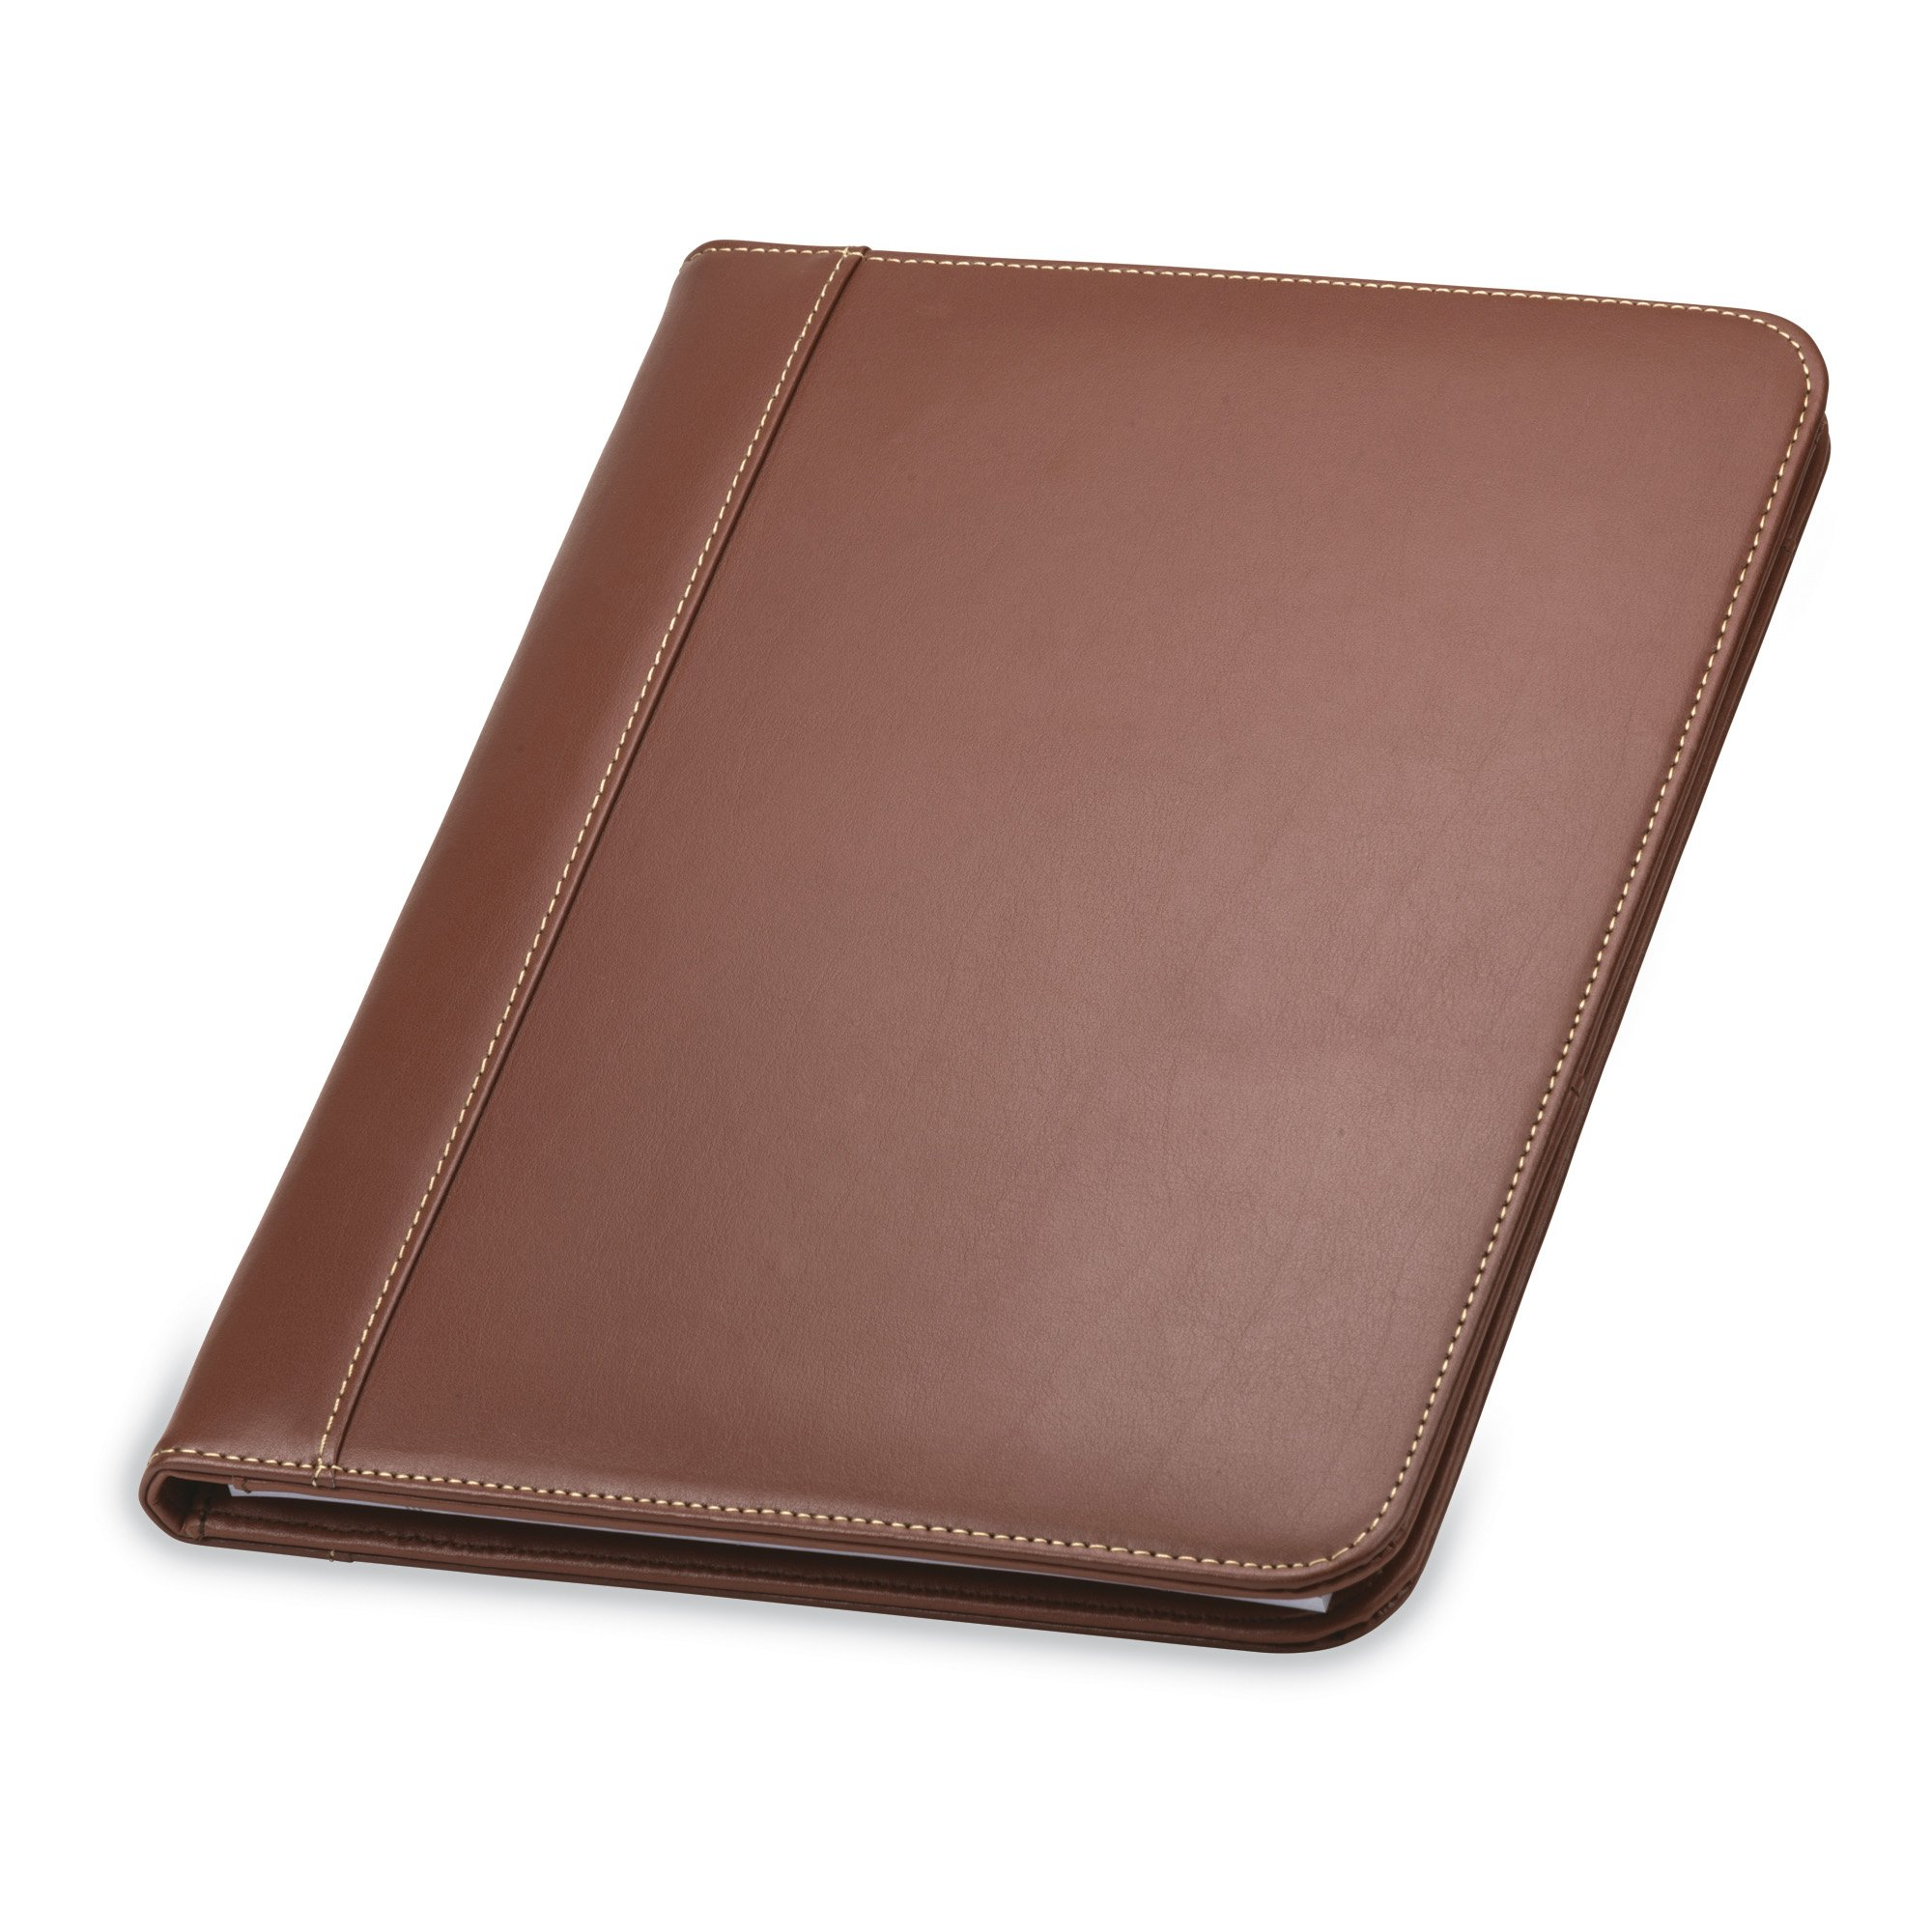 Samsill Contrast Stitch Leather Padfolio